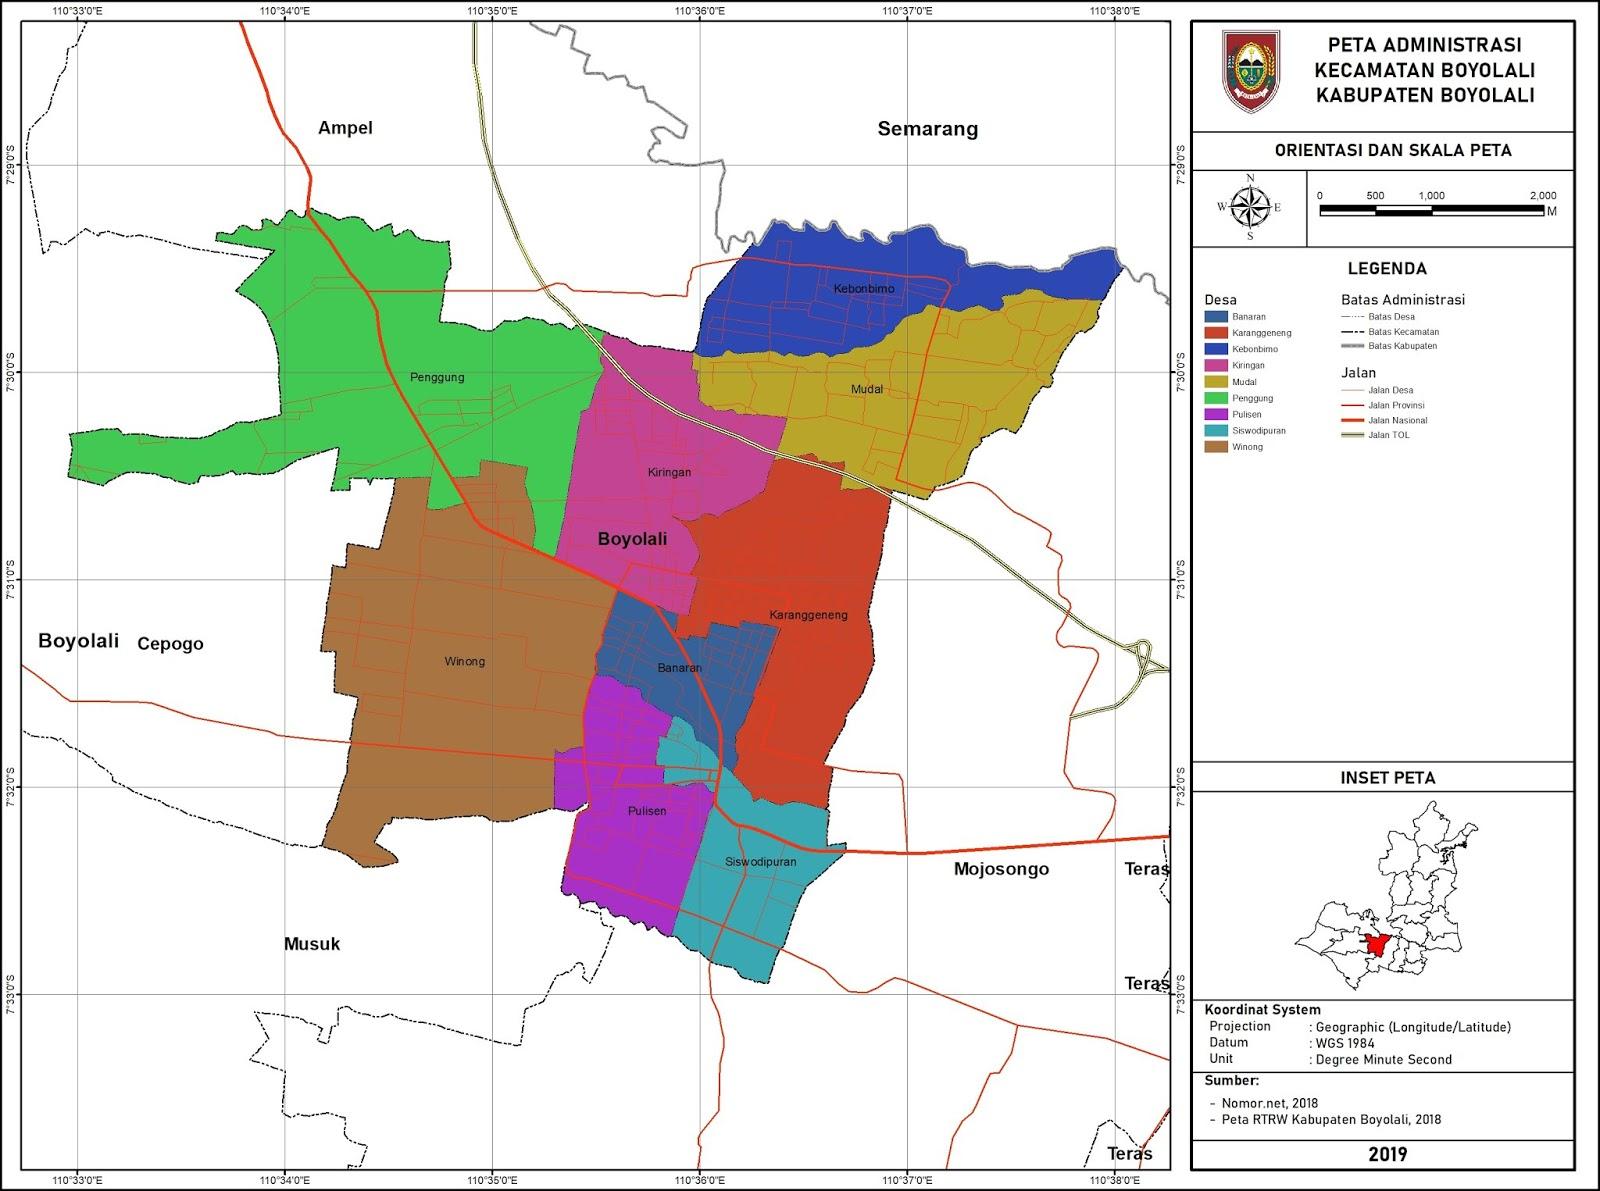 Peta Administrasi Kecamatan Boyolali, Kabupaten Boyolali ...